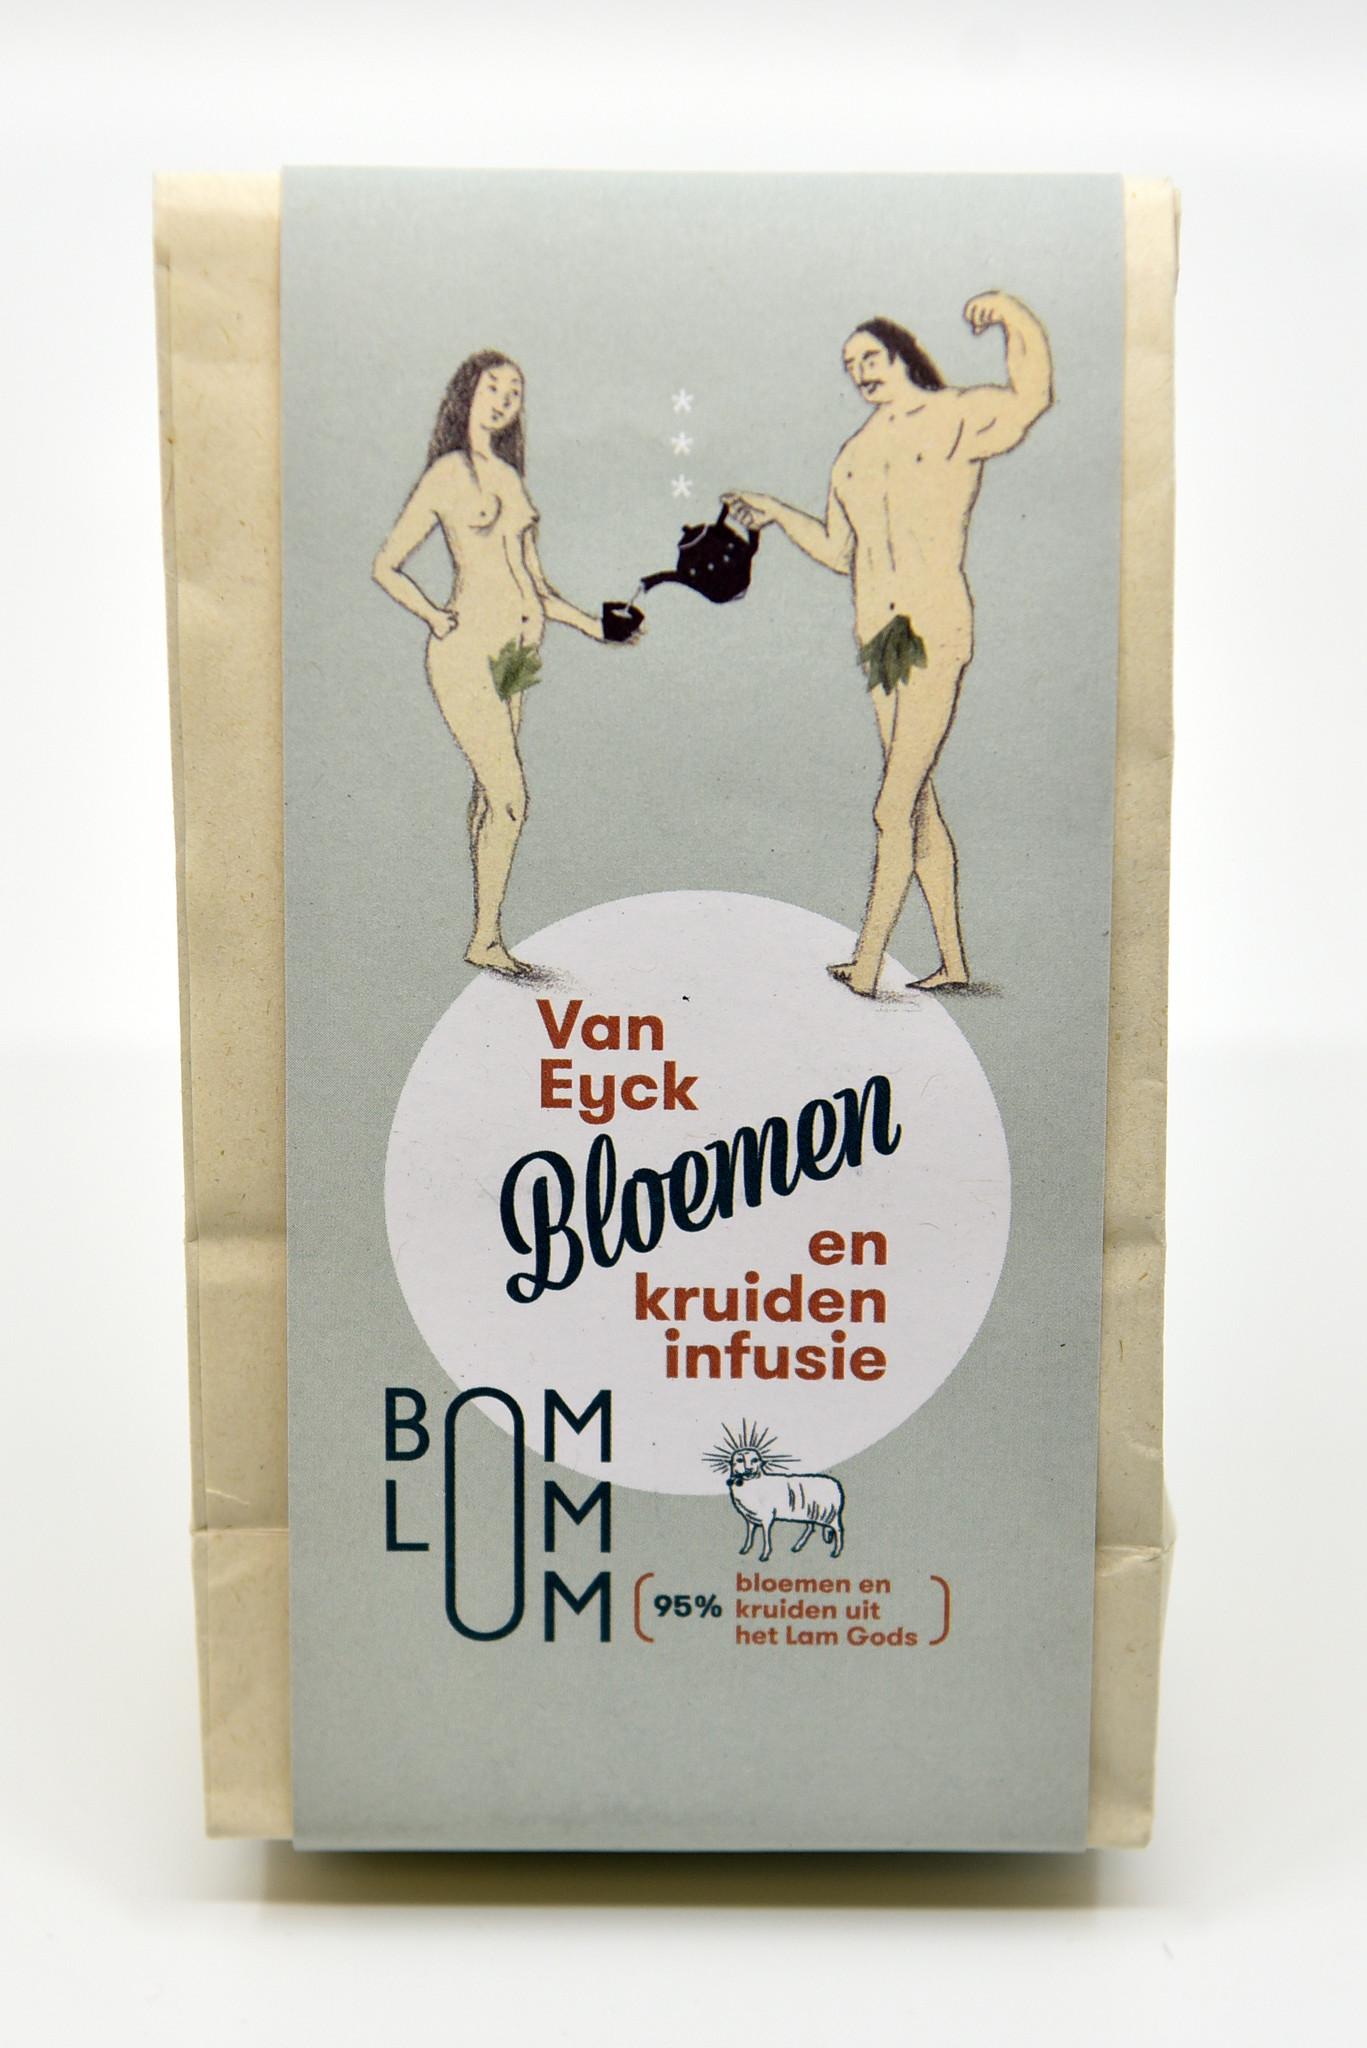 Blommm Bloemen- en kruideninfusie Van Eyck - Blommm